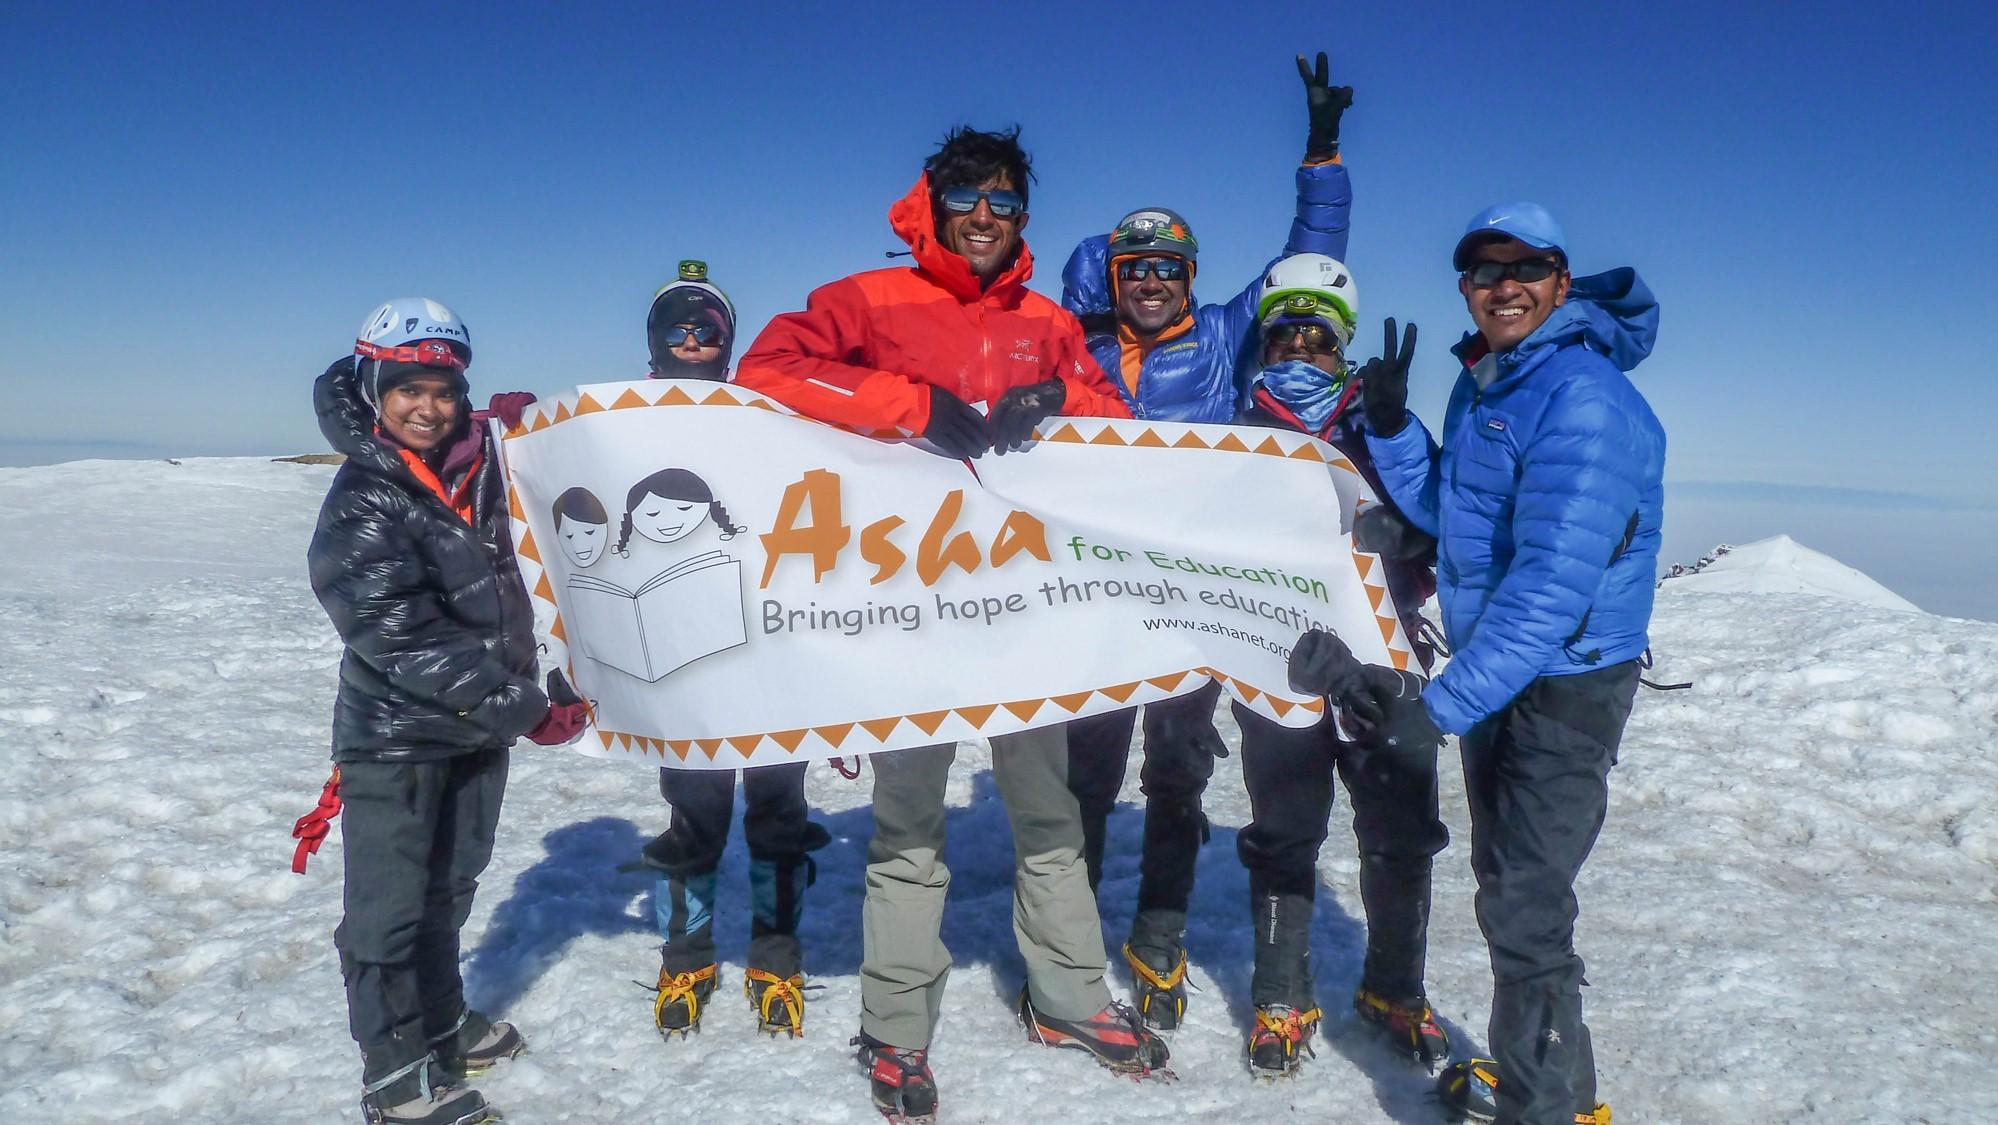 Team Asha Climbing Program